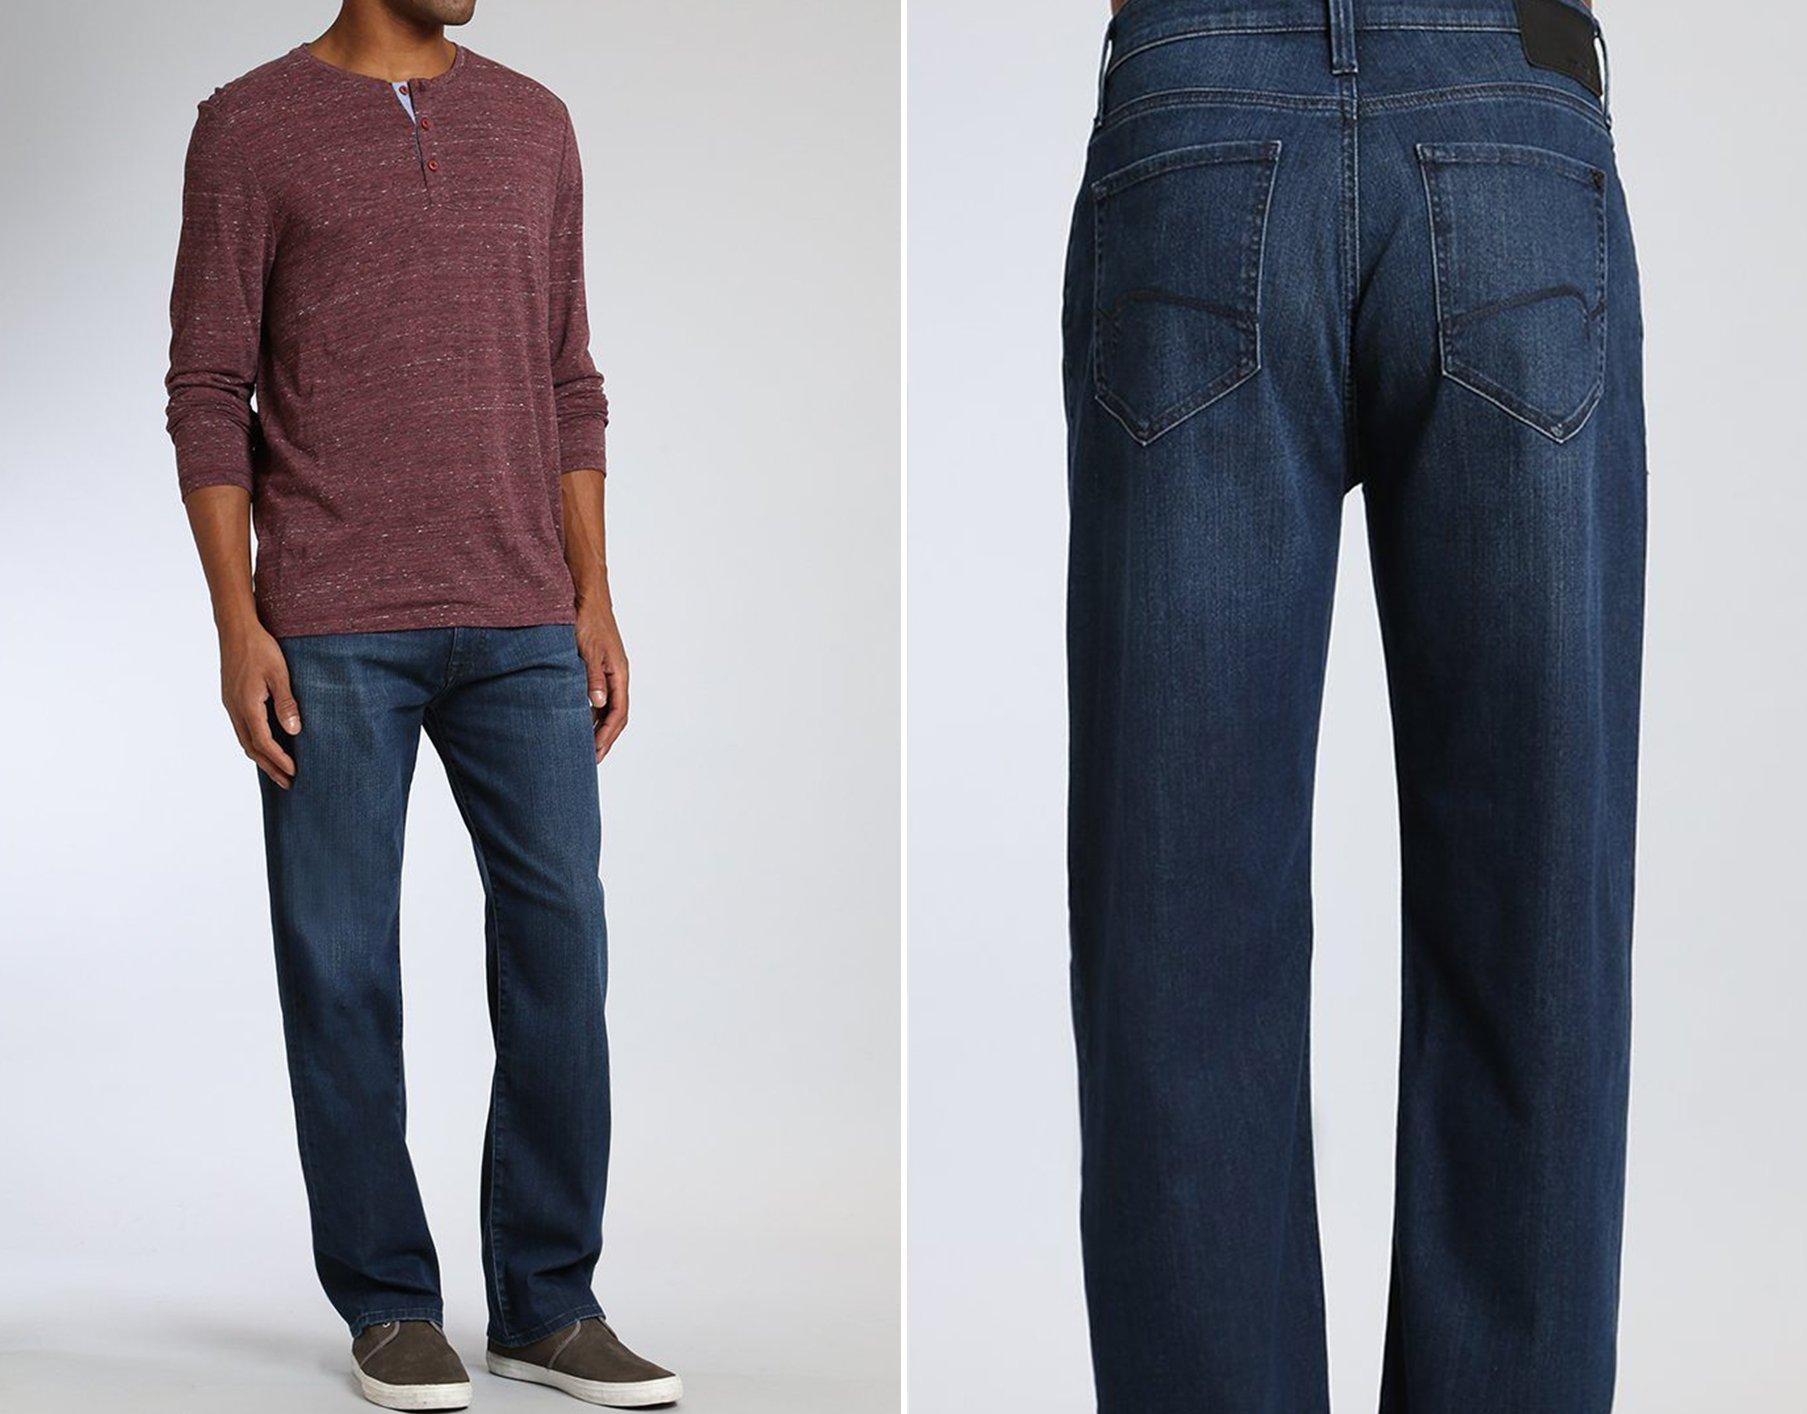 Mavi Men's Marcus Slim Straight Leg Jeans in Dark Blue Athletic